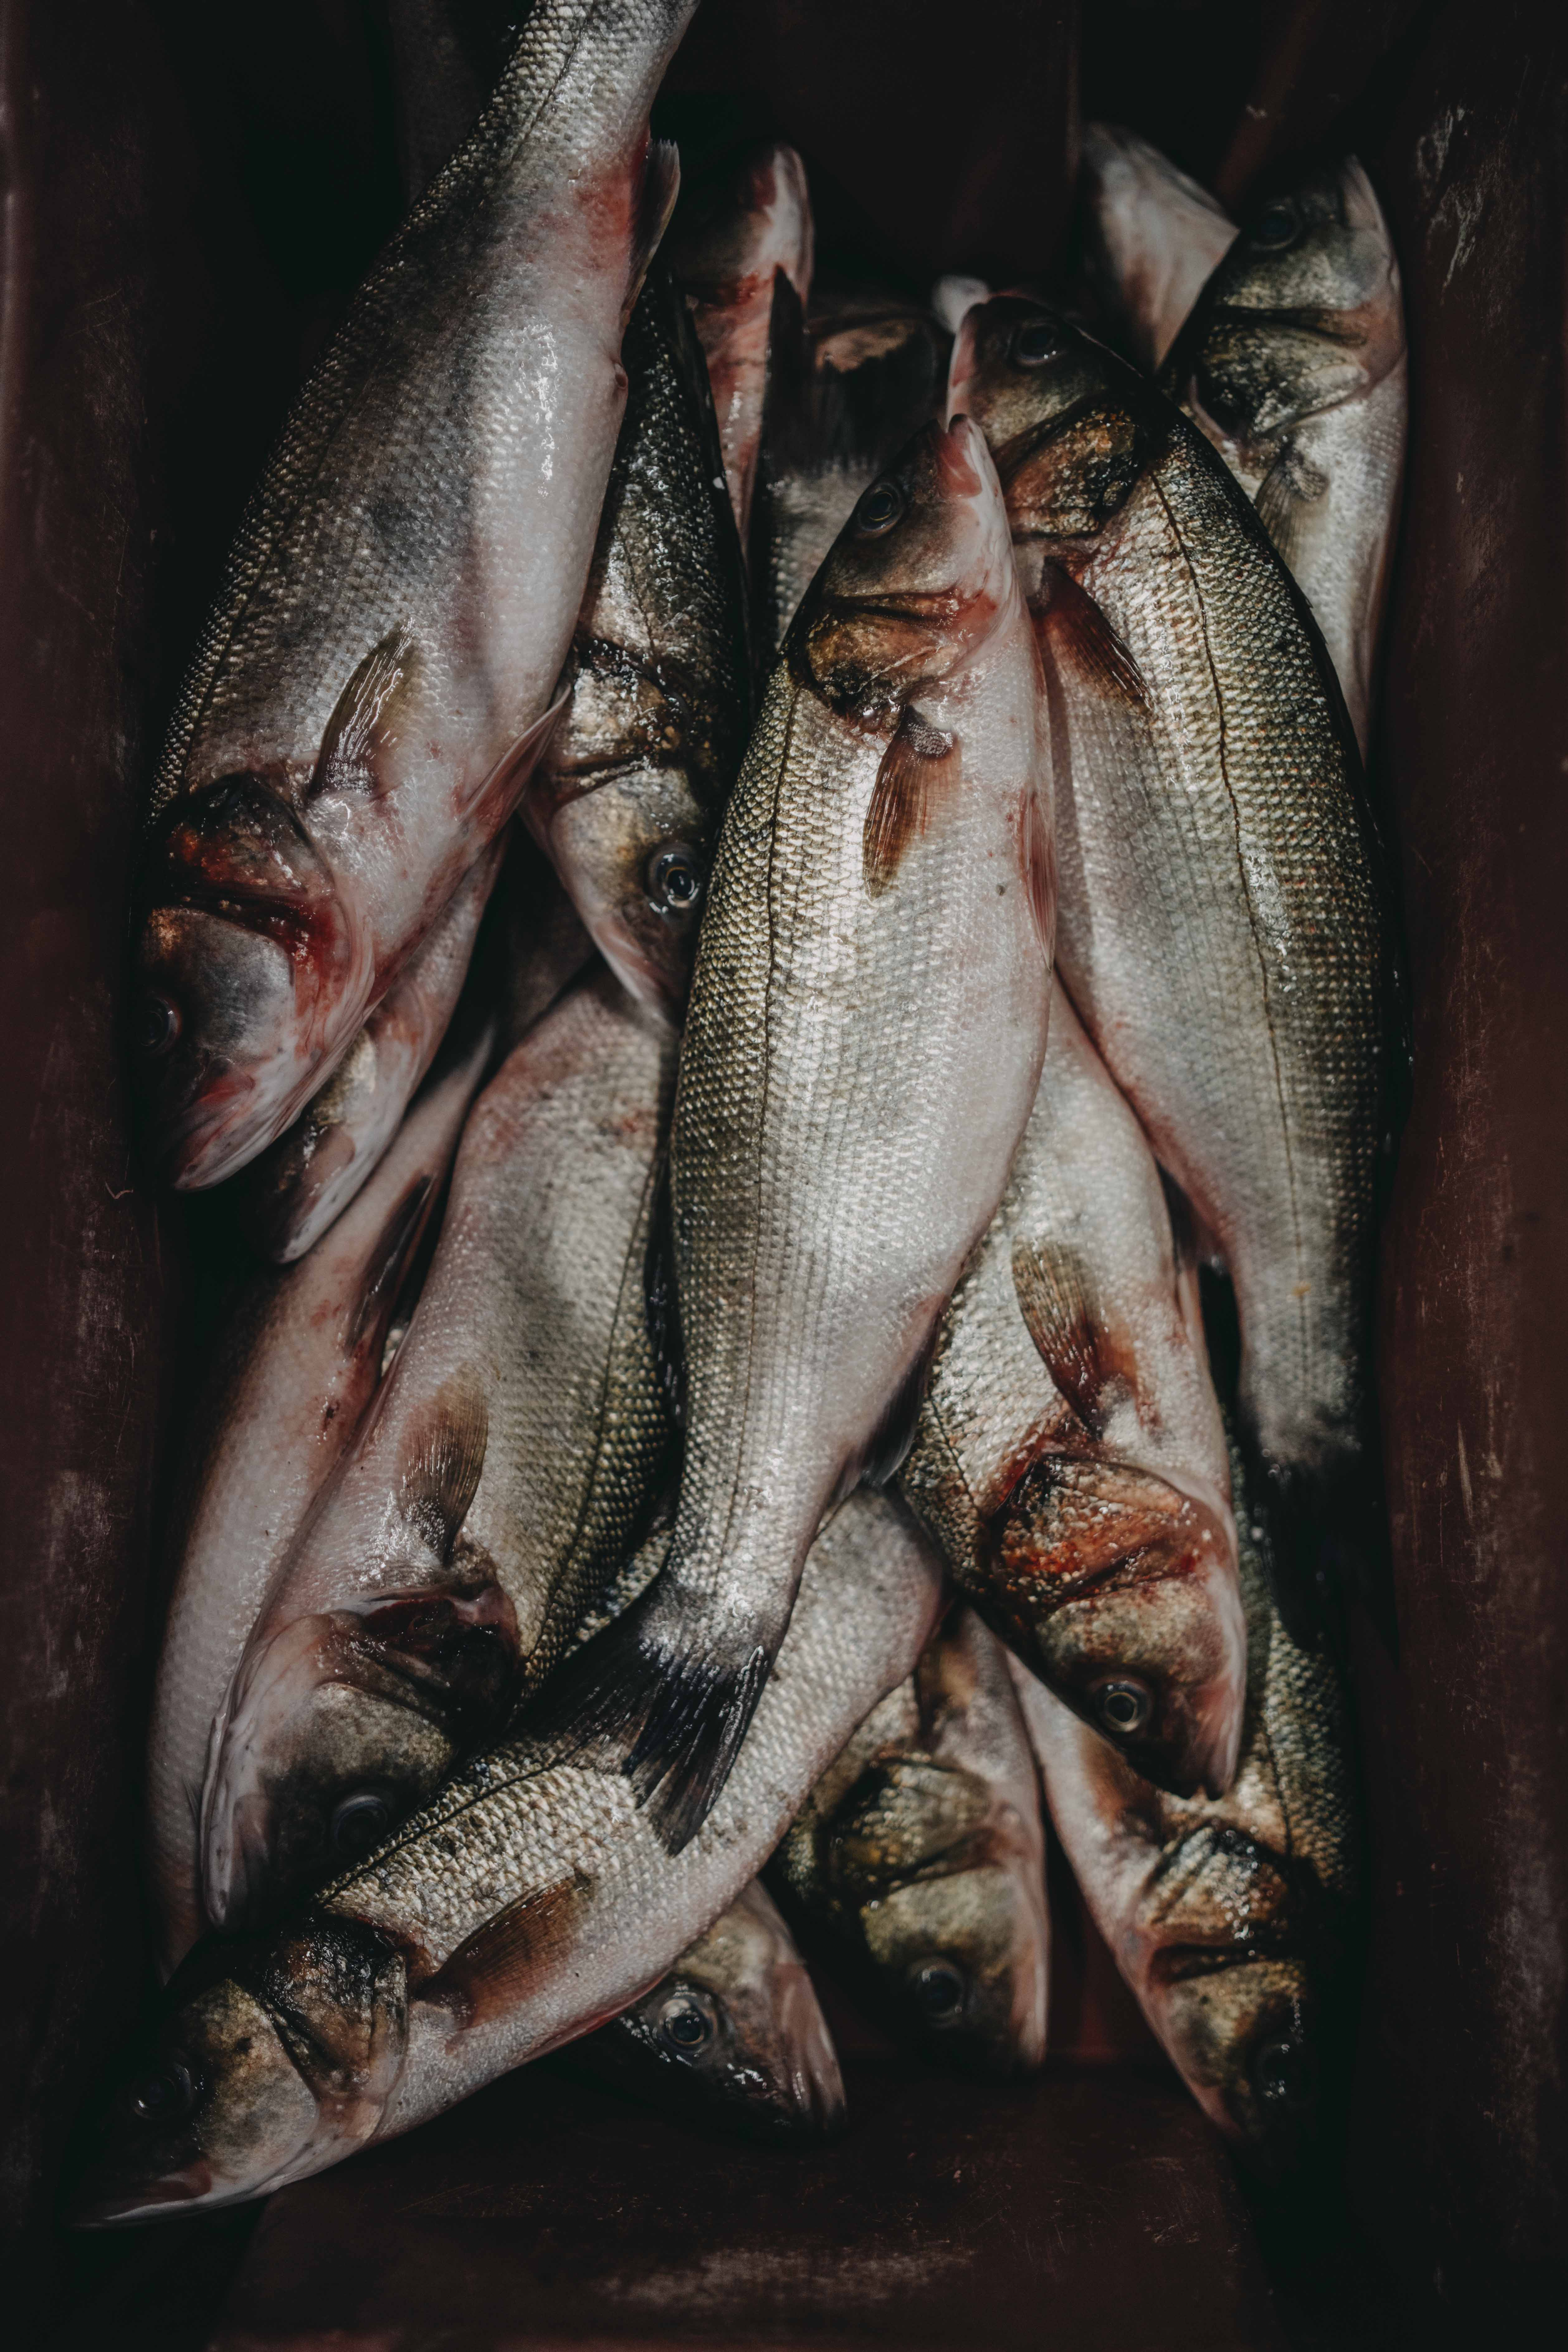 201600406_-_Food_Inspiration_-_Restaurant_Inter_Scaldes_-_©_Chantal_Arnts_22_1